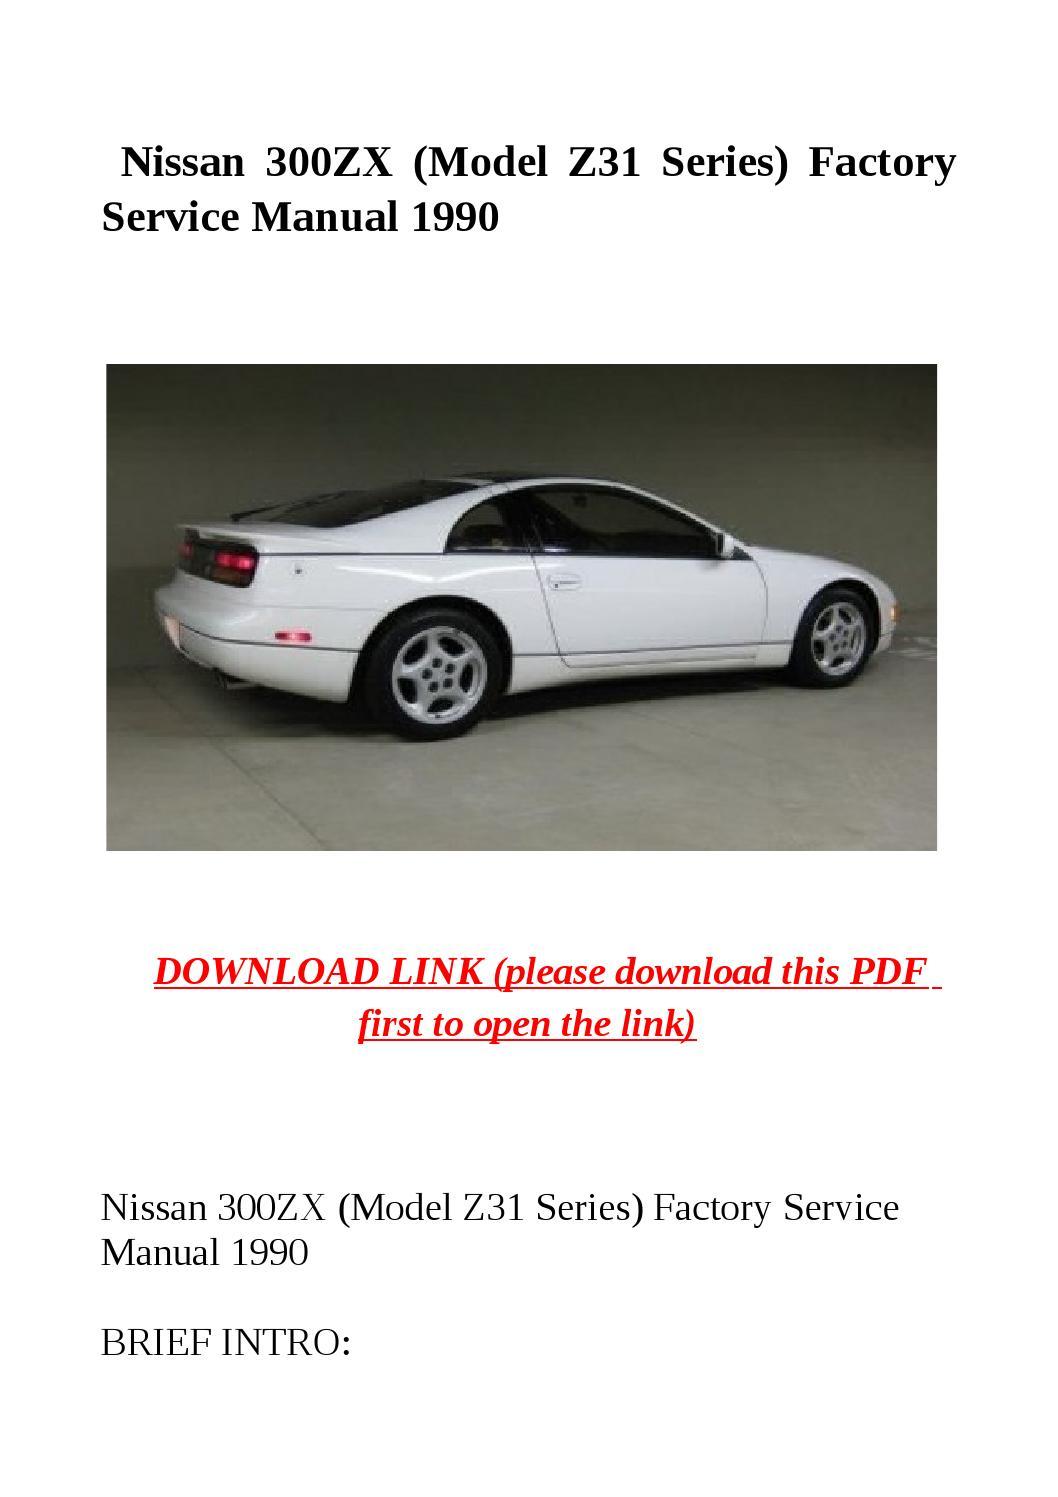 Nissan 300zx (model z31 series) factory service manual 1990 by Jacky Dean -  issuu